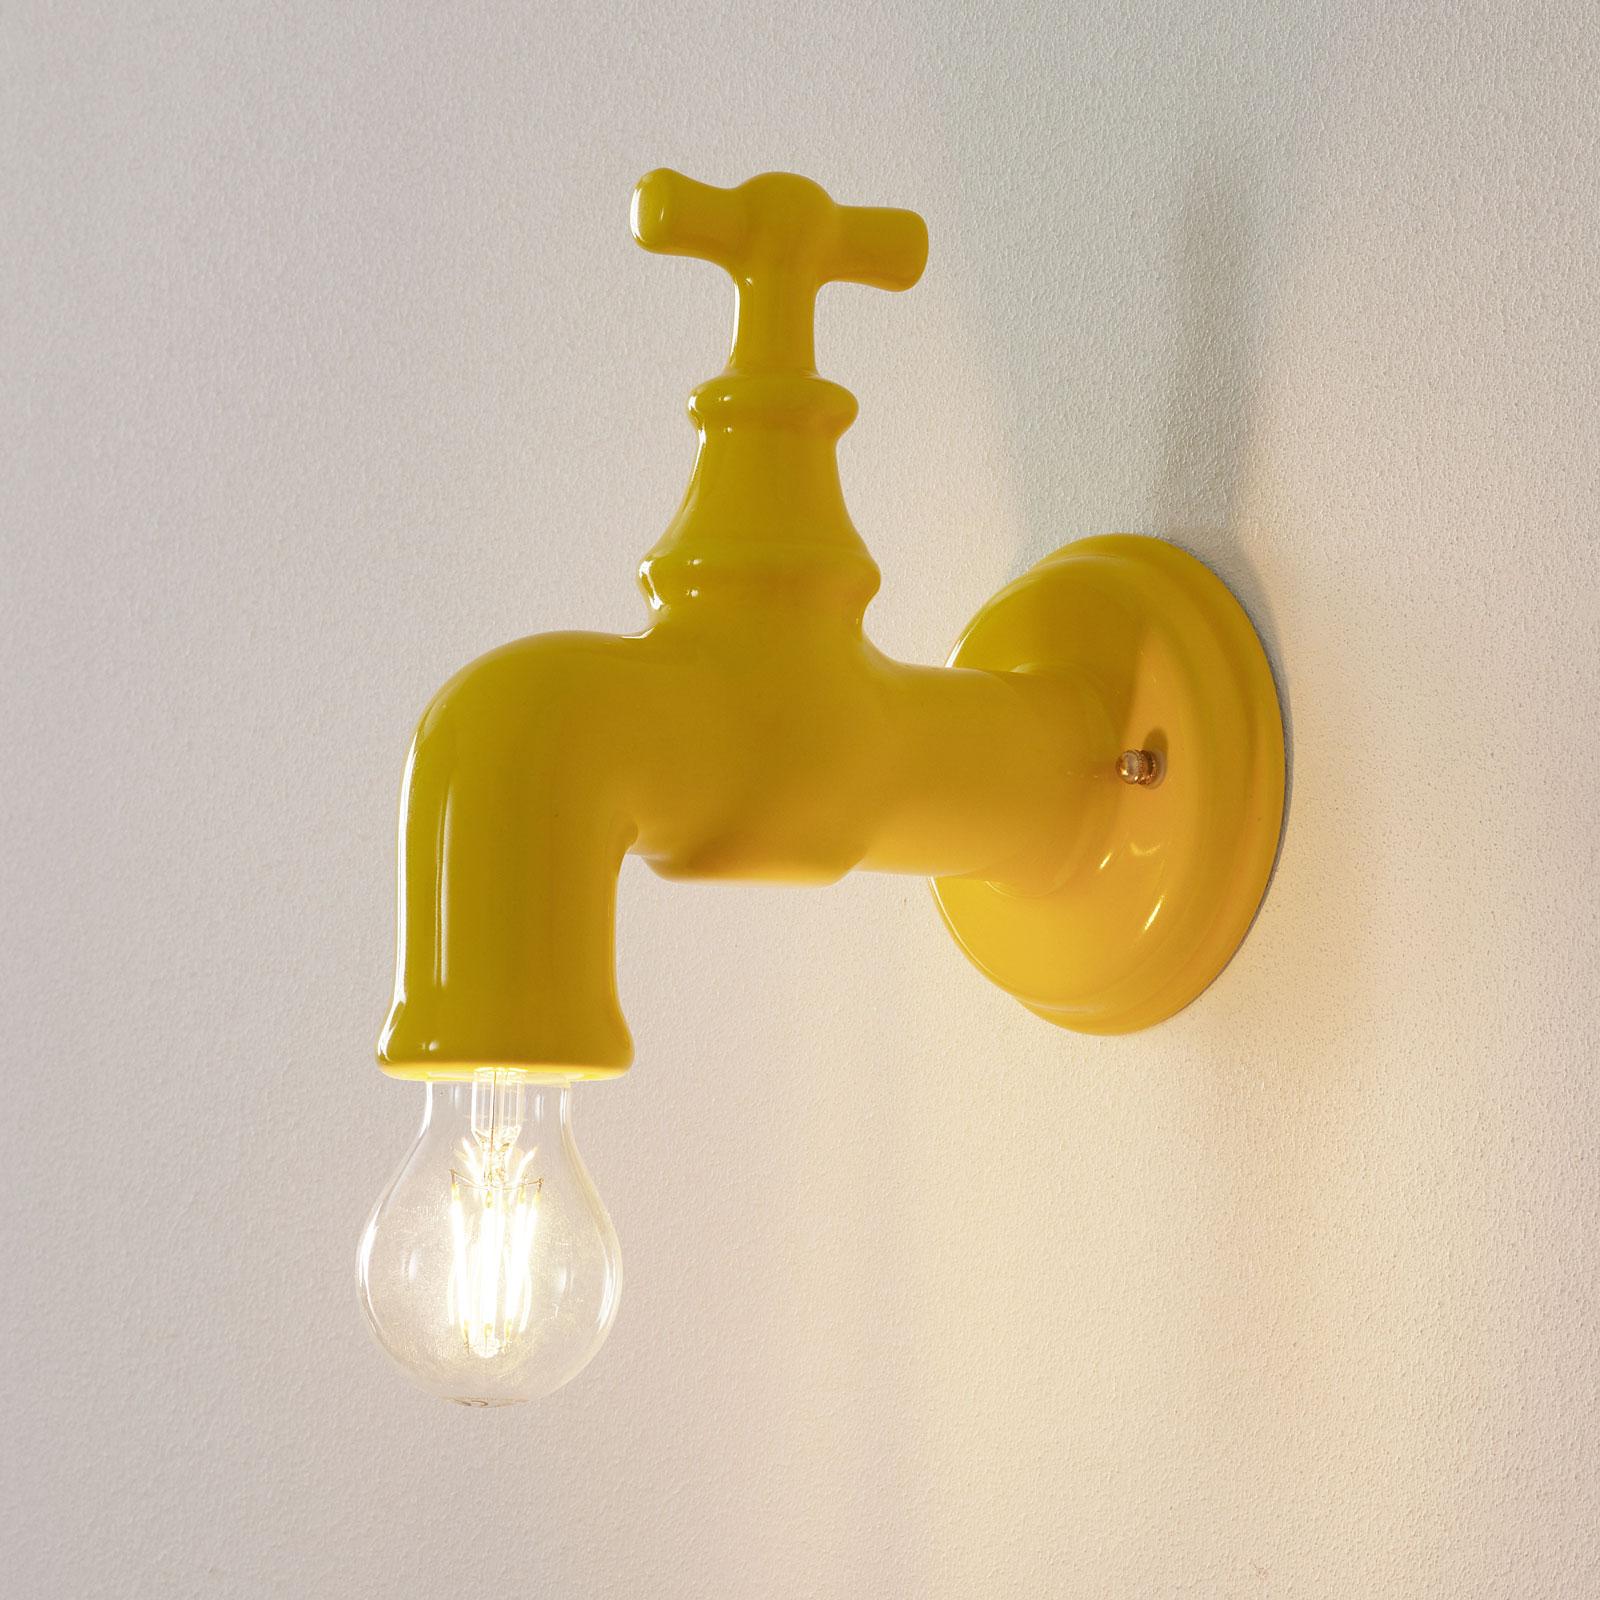 Keramik-Wandlampe A189, gelb glänzend